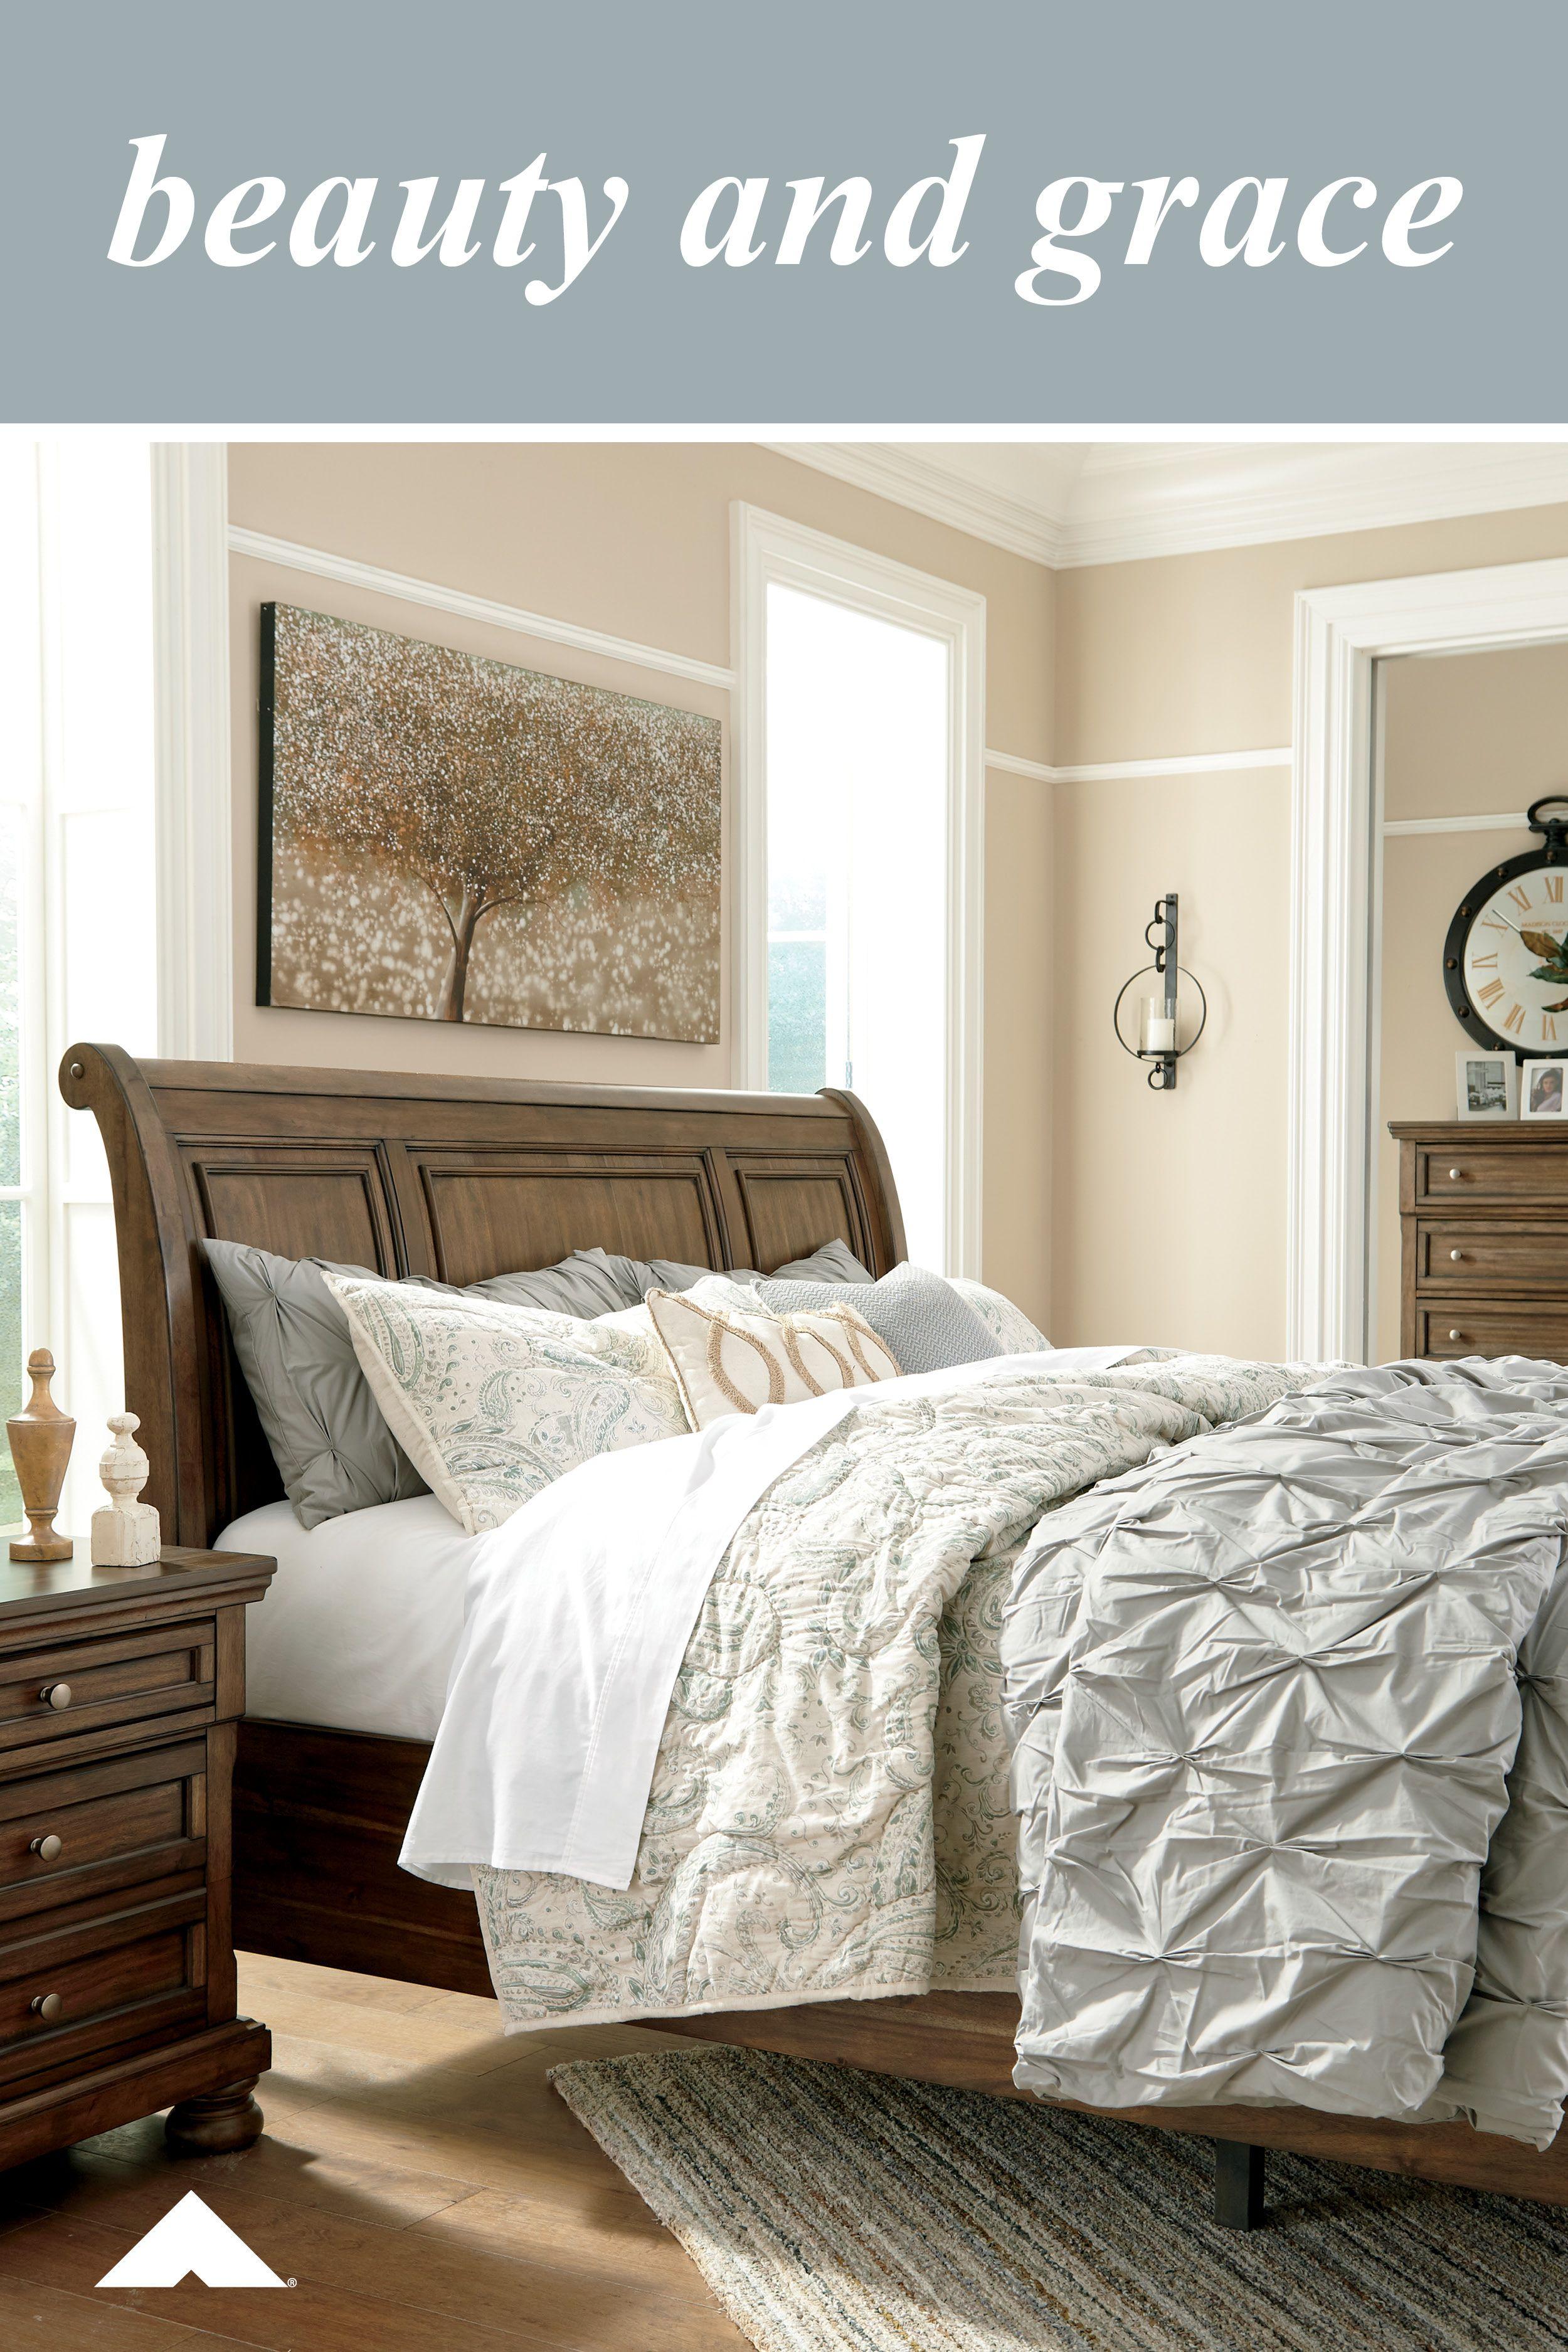 Rana Furniture Bedroom Sets : furniture, bedroom, Flynnter, Master, Bedroom, Ashley, Furniture, Fresh,, Traditional, Style., Flynnte…, Furniture,, Contemporary